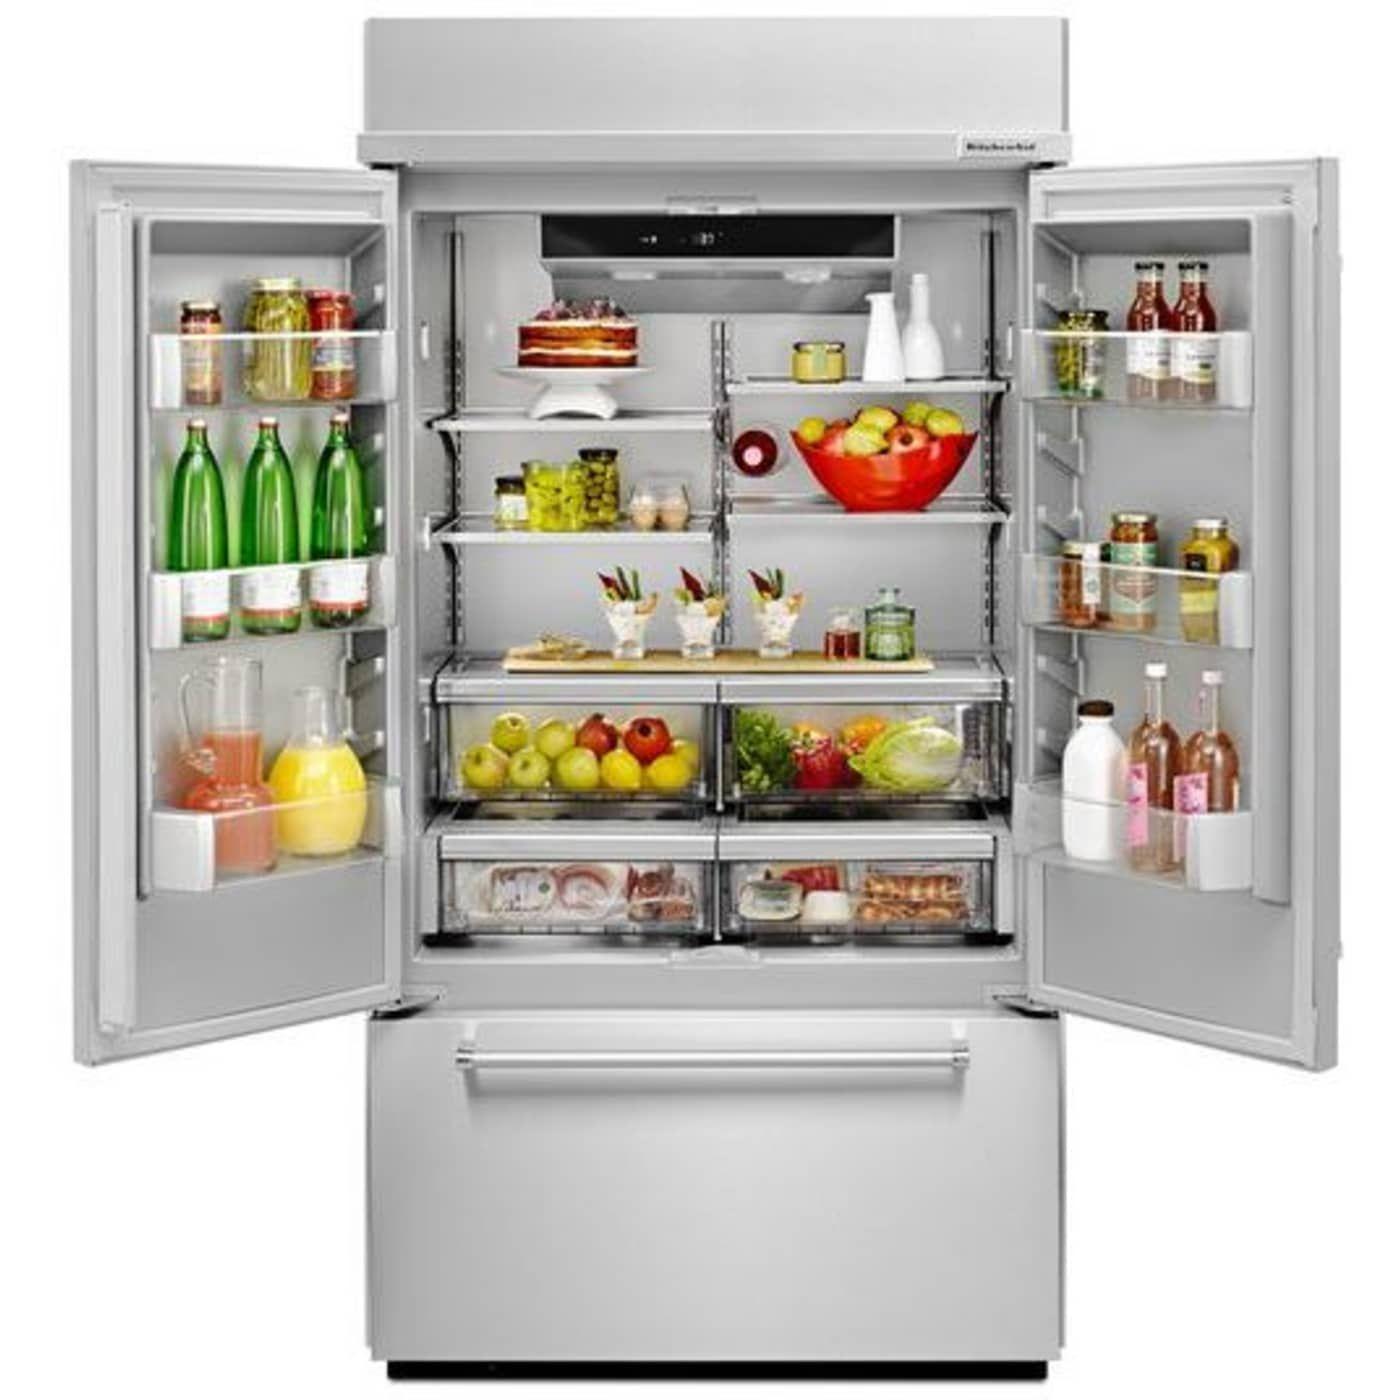 Kbfn502ess by kitchenaid french door refrigerators